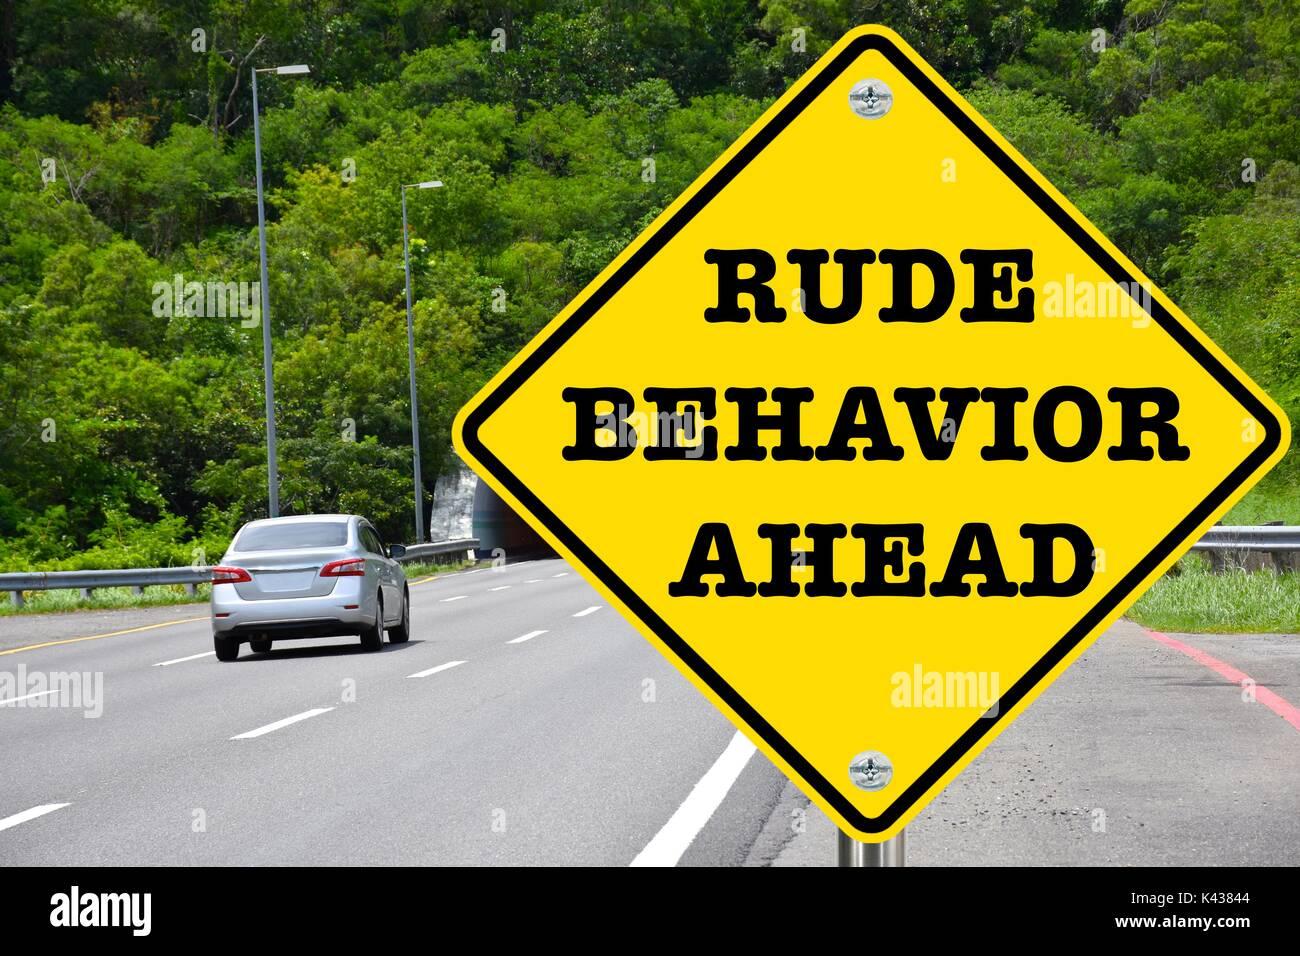 Rude behavior ahead, yellow warning road sign - Stock Image